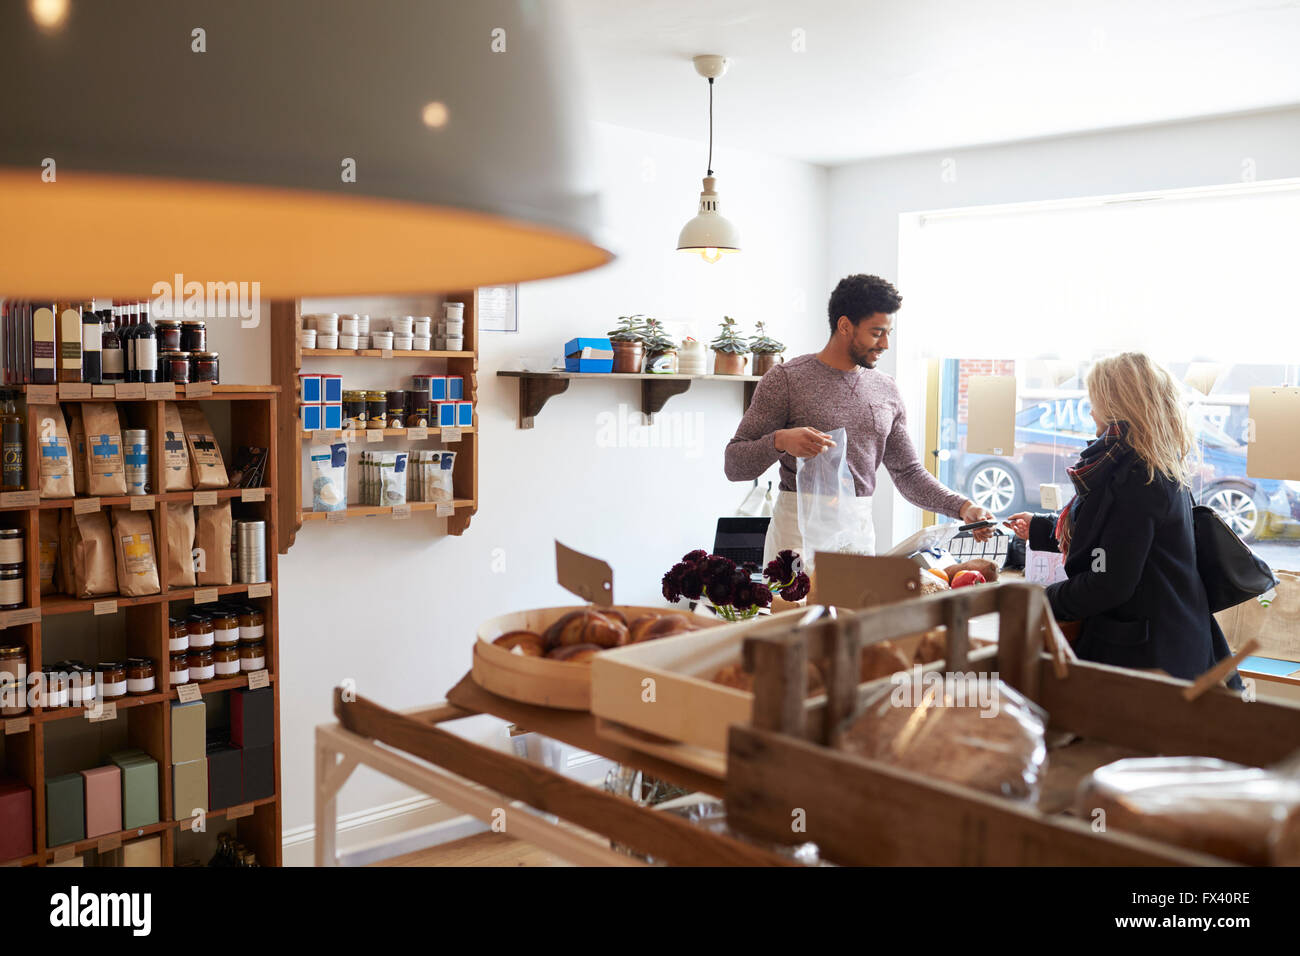 Male Sales Assistant Serving Female Customer In Delicatessen Stock Photo